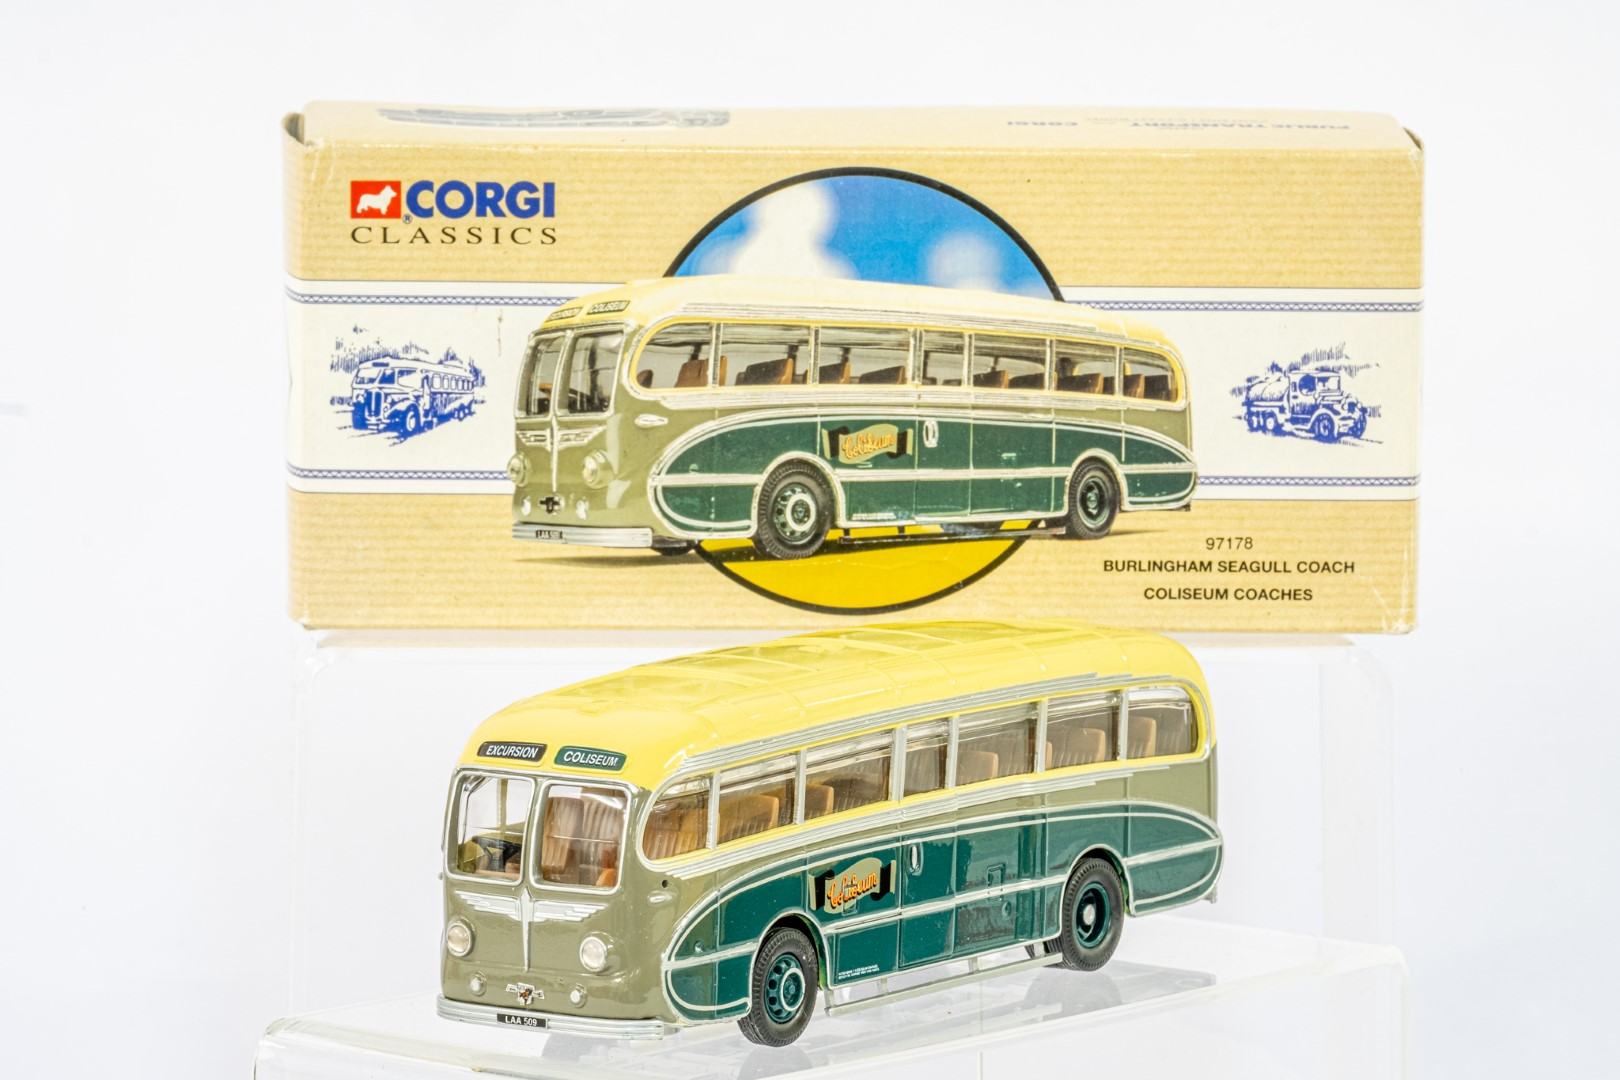 Corgi Burlingham Seagull Coach - Coliseum Coaches / Landrover Winch & 2 Wheel Loader - Tarmac - Image 2 of 3